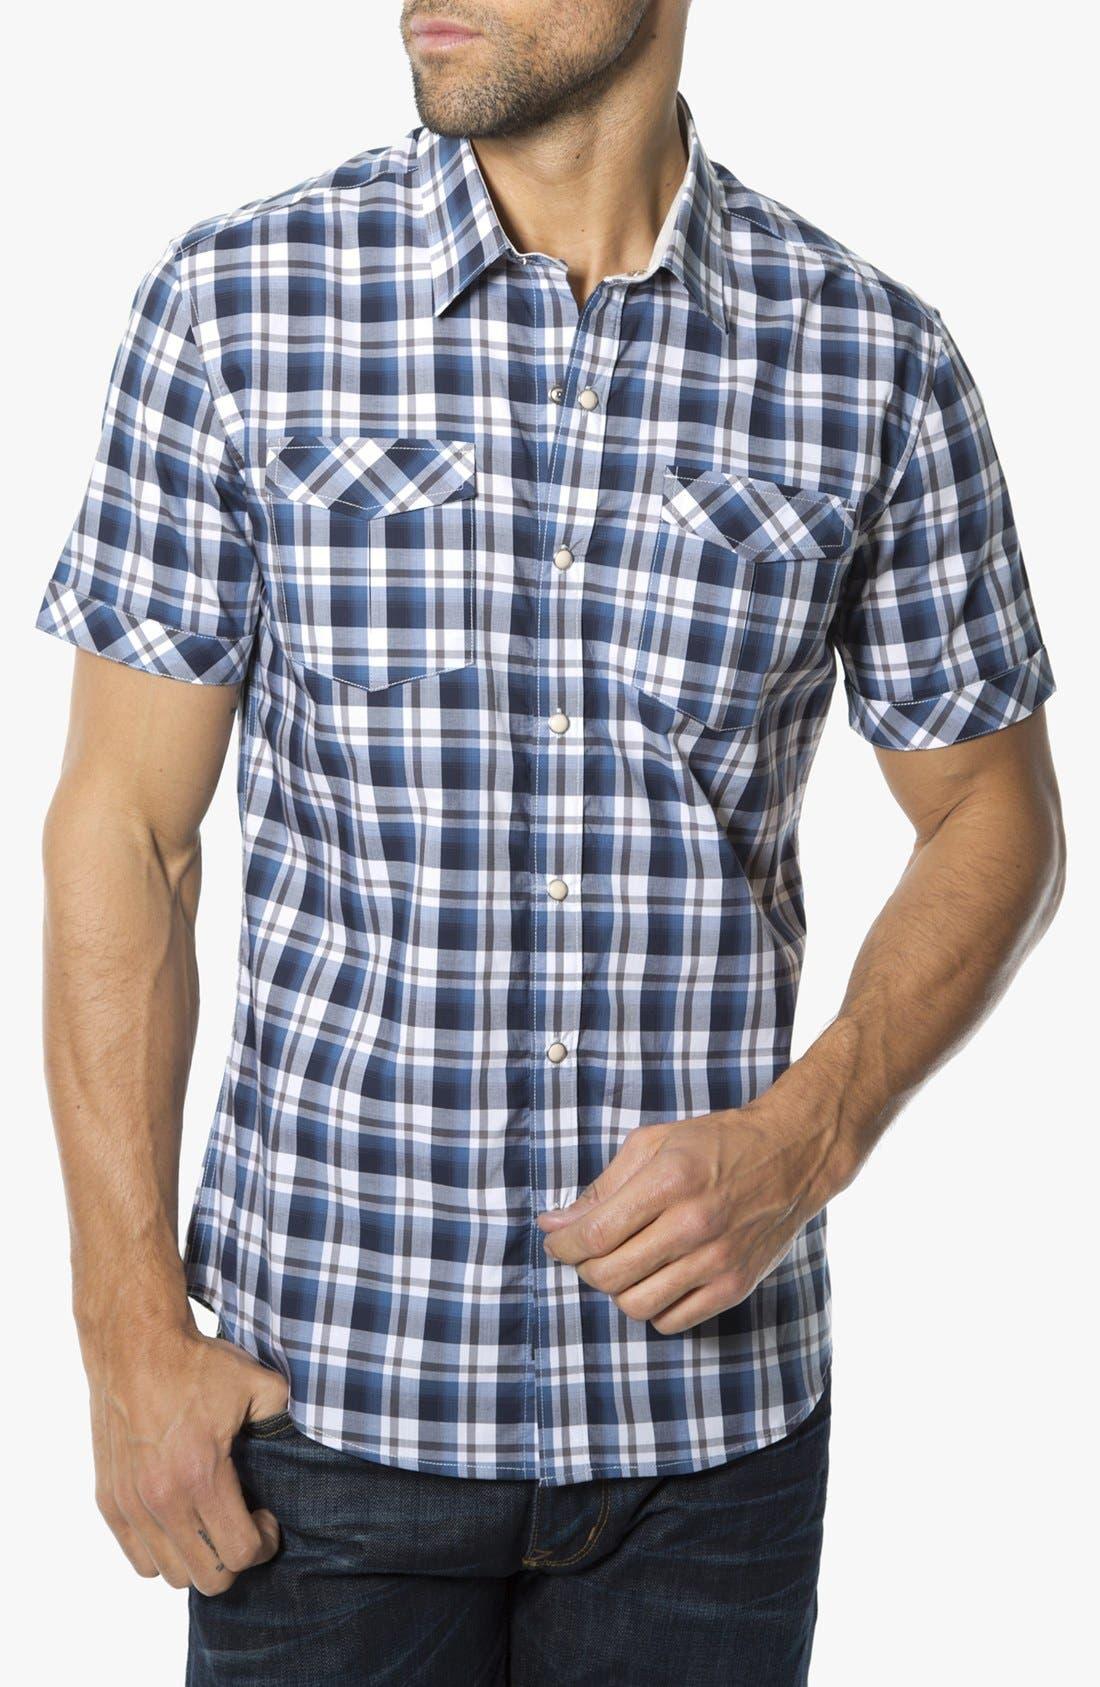 Alternate Image 1 Selected - 7 Diamonds 'Best Thing for Me' Woven Short Sleeve Shirt